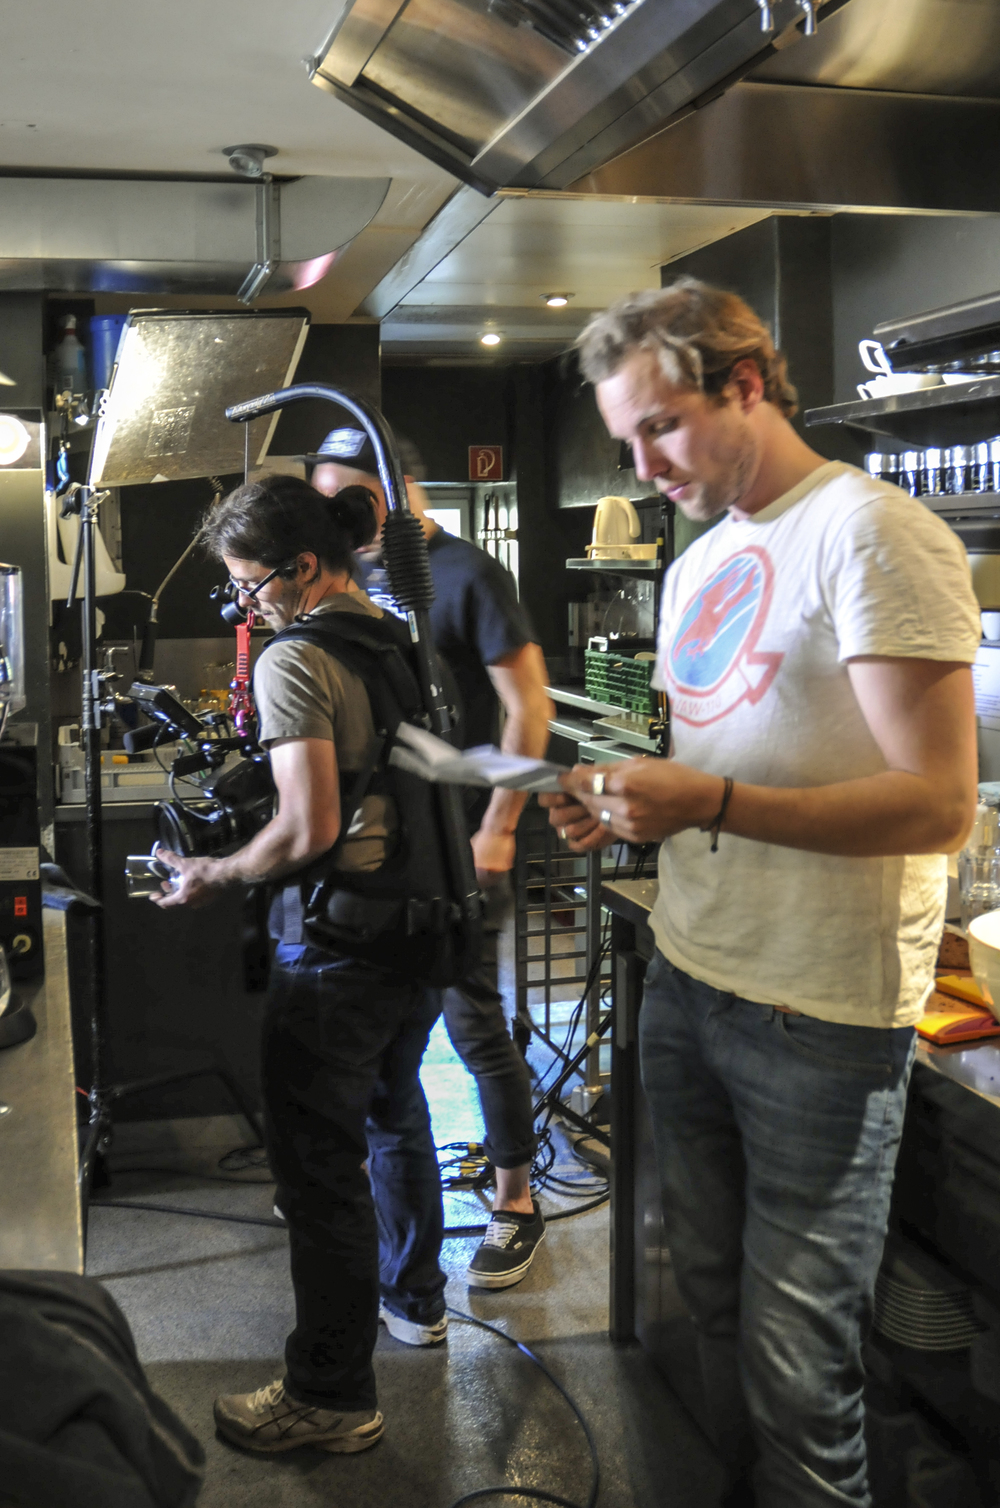 Regisseur Dominik Suppiger et moi. (Foto: Jela Hasler)